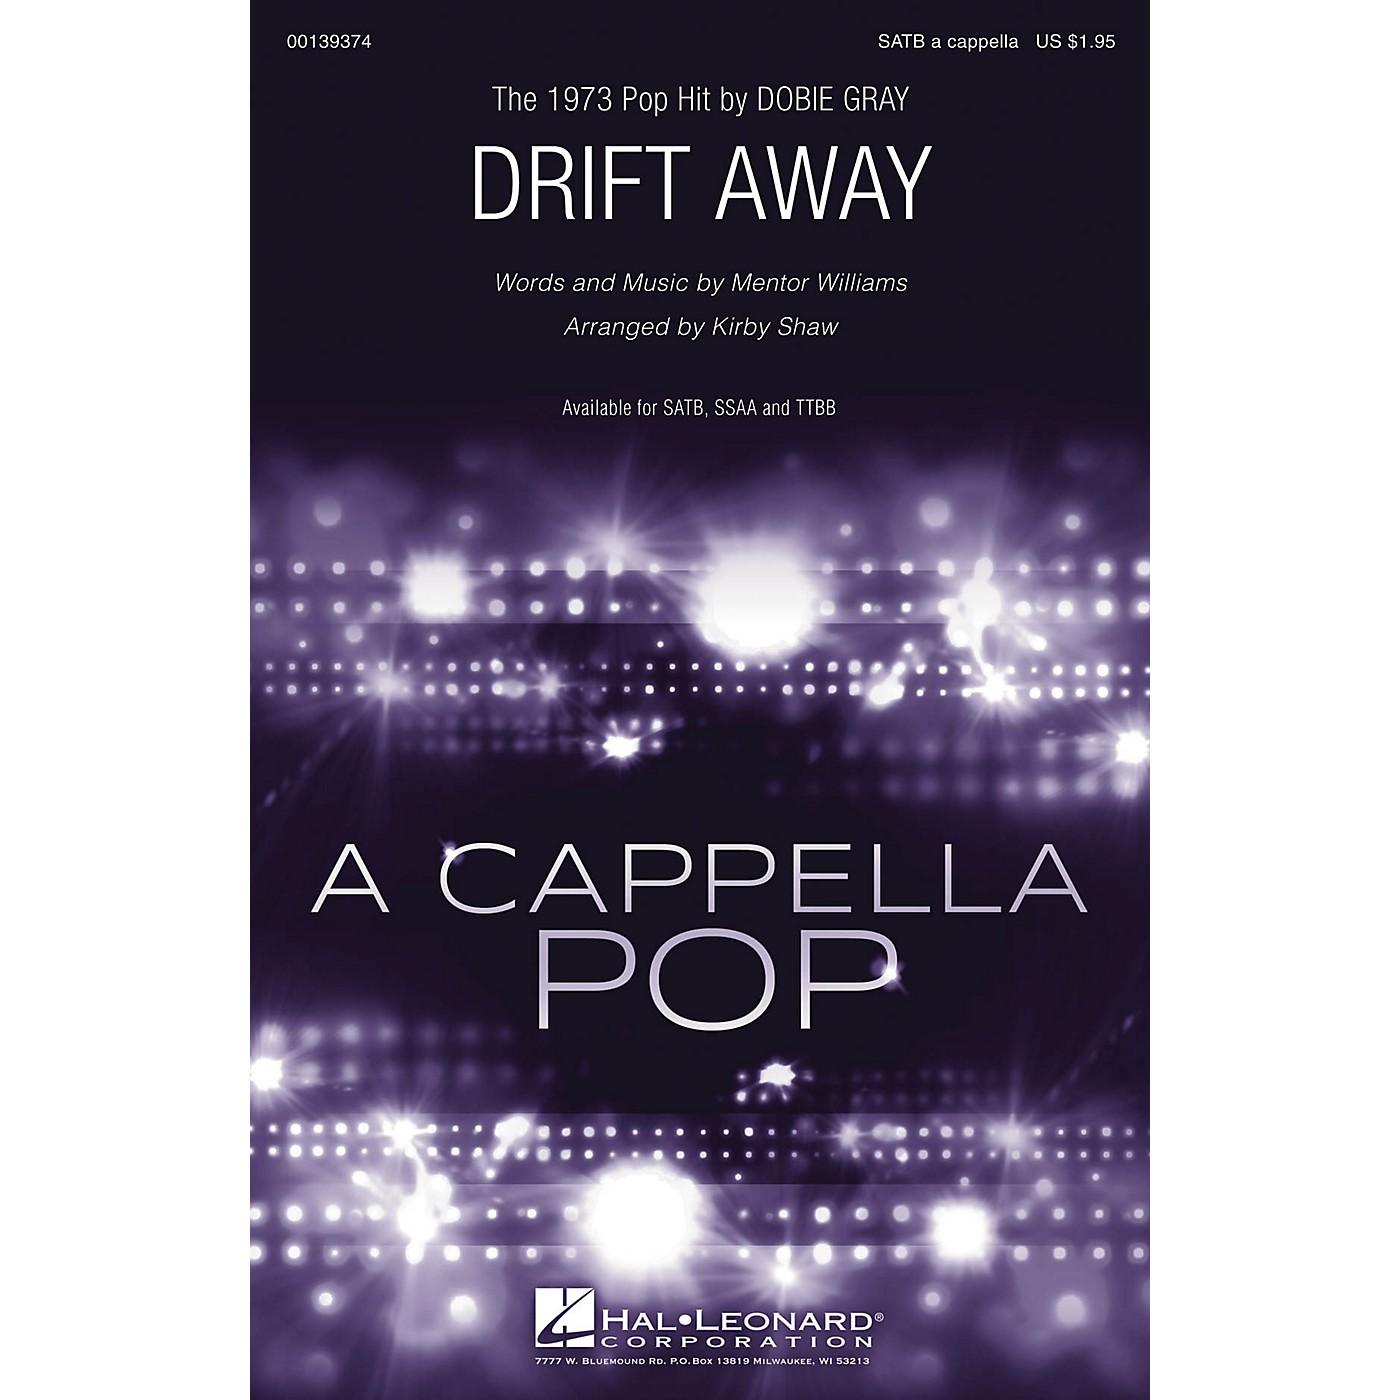 Hal Leonard Drift Away SATB a cappella by Dobie Gray arranged by Kirby Shaw thumbnail